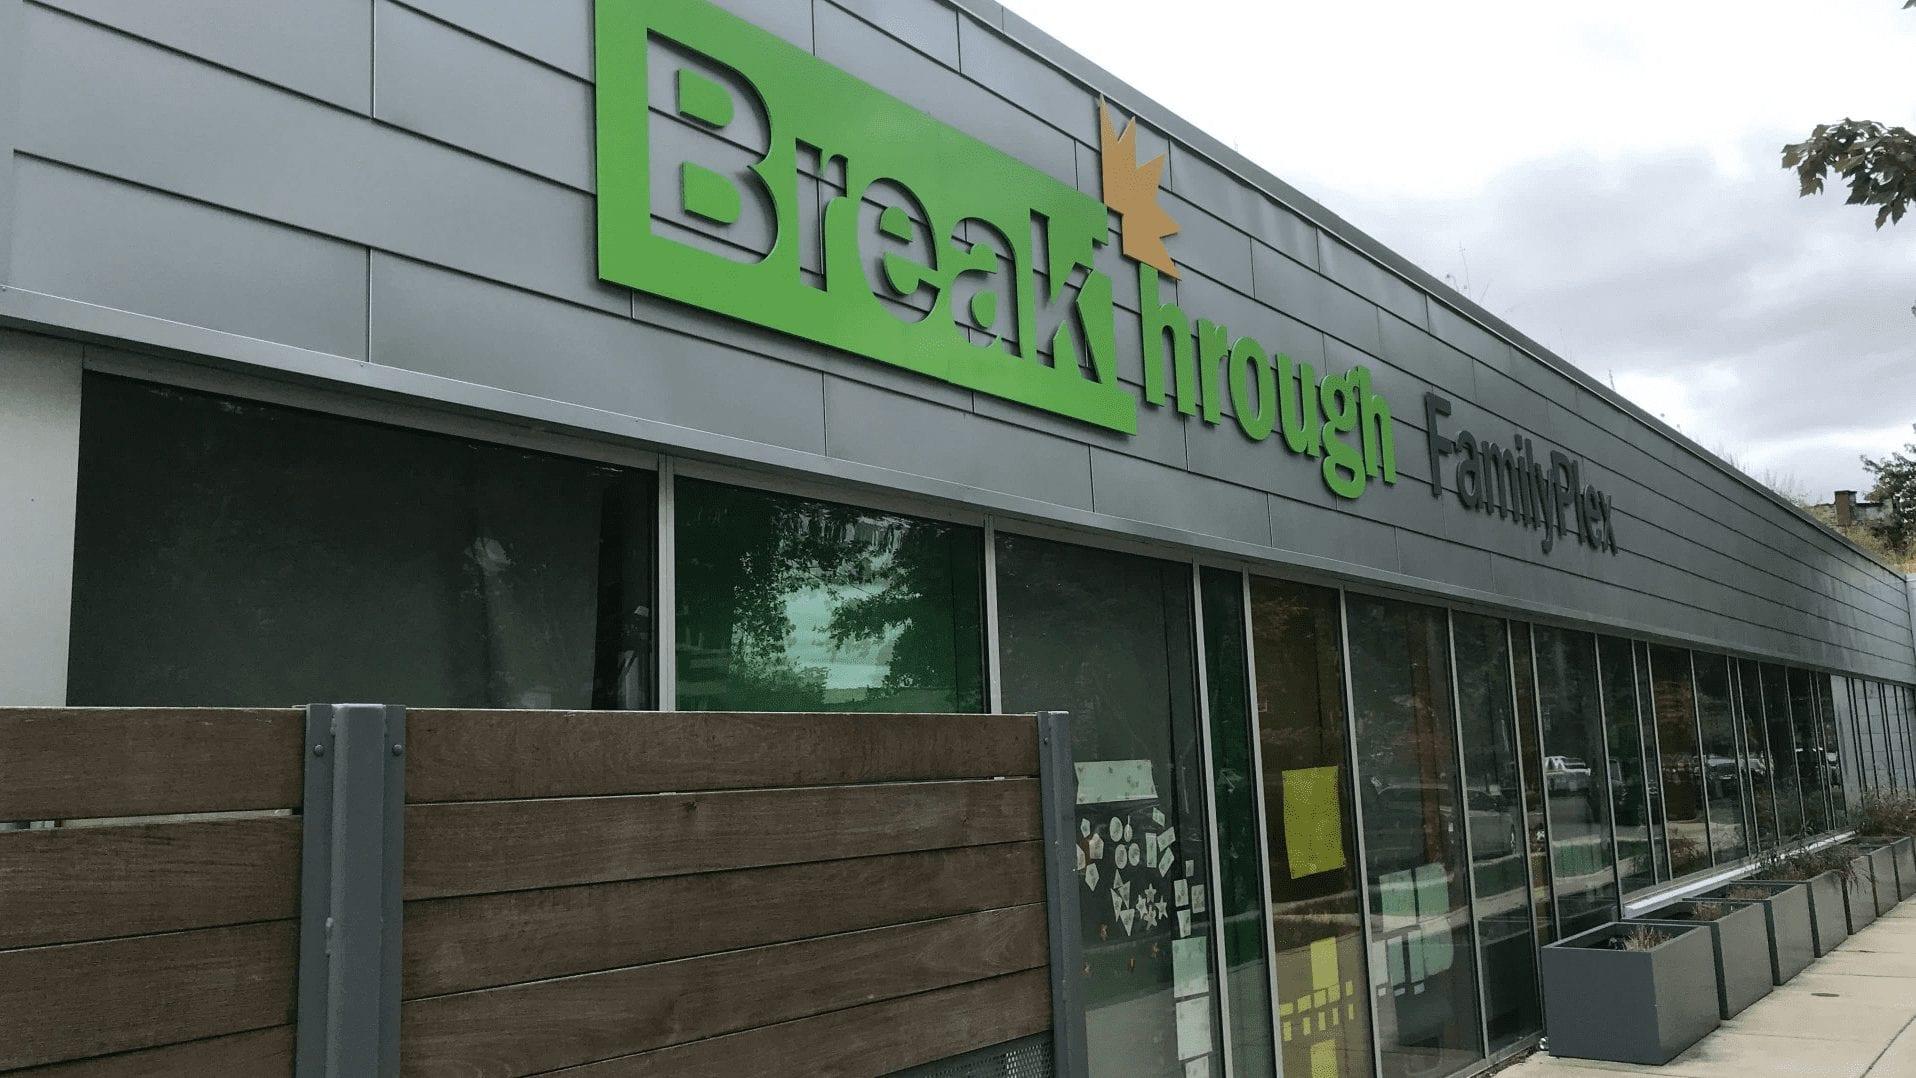 Breakthrough FamilyPlex sign on front of community center building